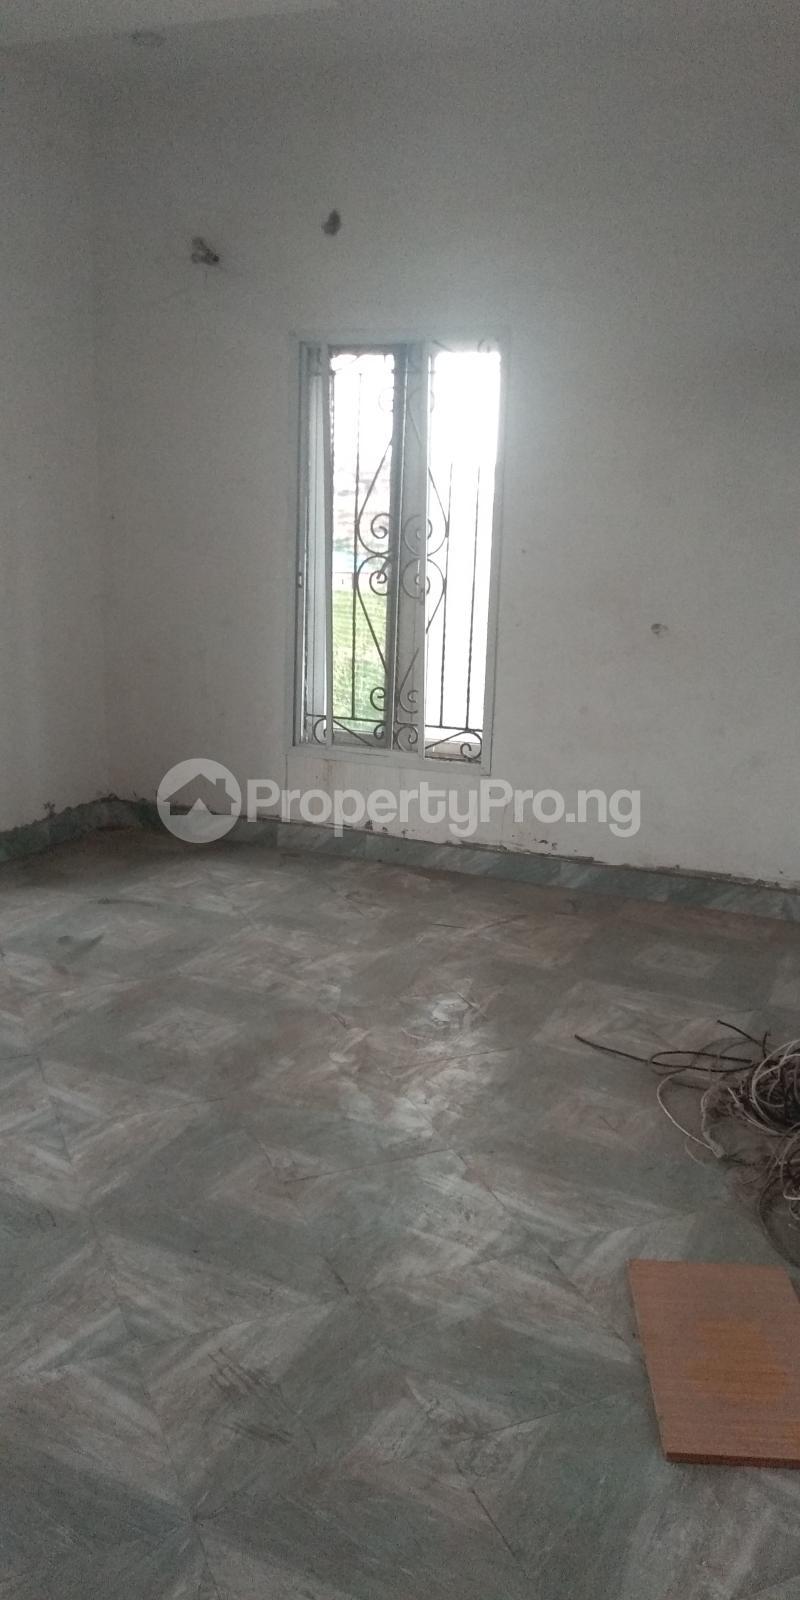 5 bedroom Land for sale Bashiru shittu street magodo shangisha Magodo GRA Phase 2 Kosofe/Ikosi Lagos - 15